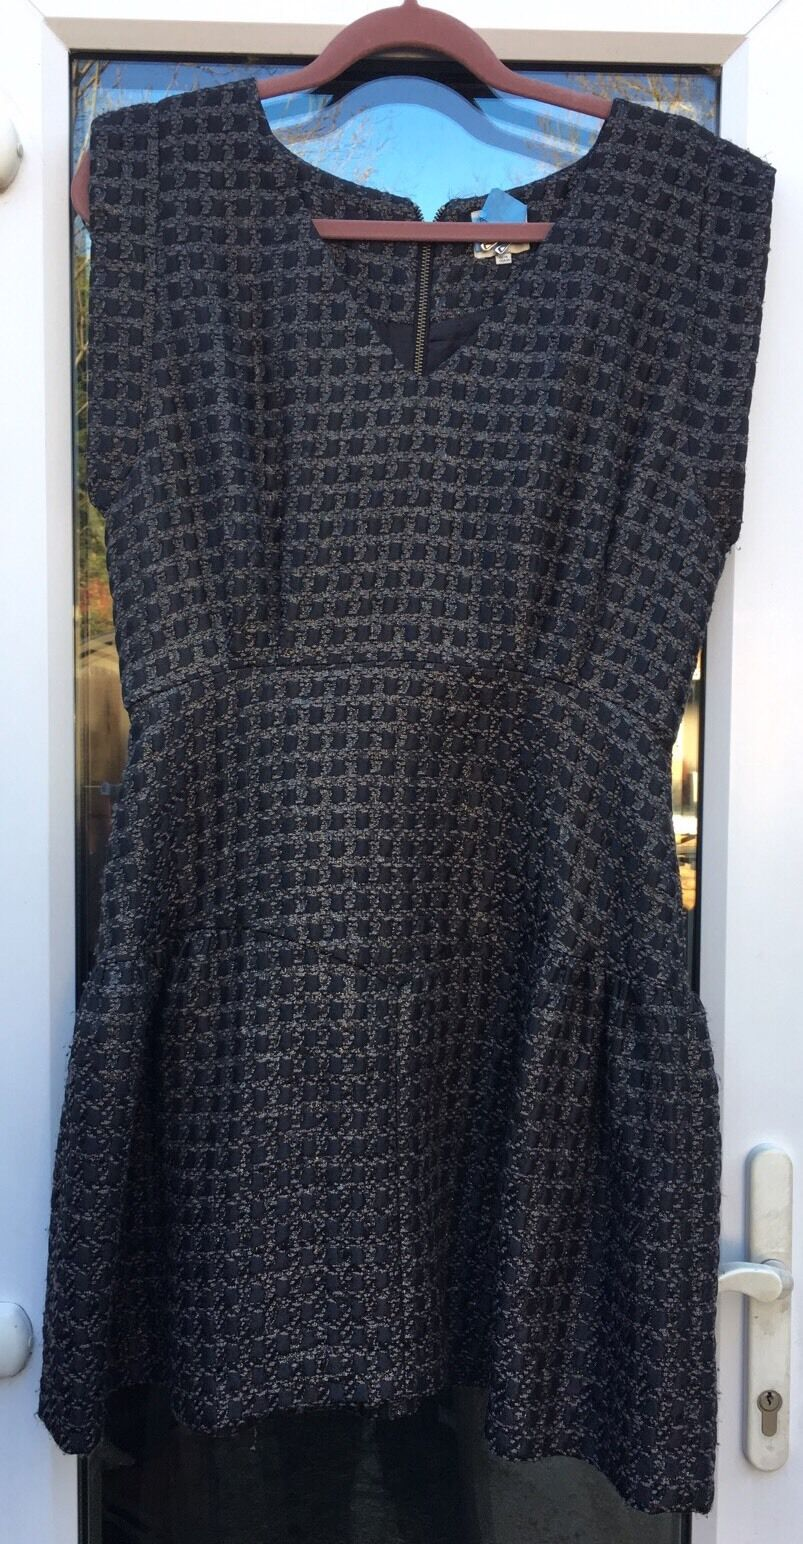 REISS breve Texture nero & oro DRESS PARTY NATALE US 10